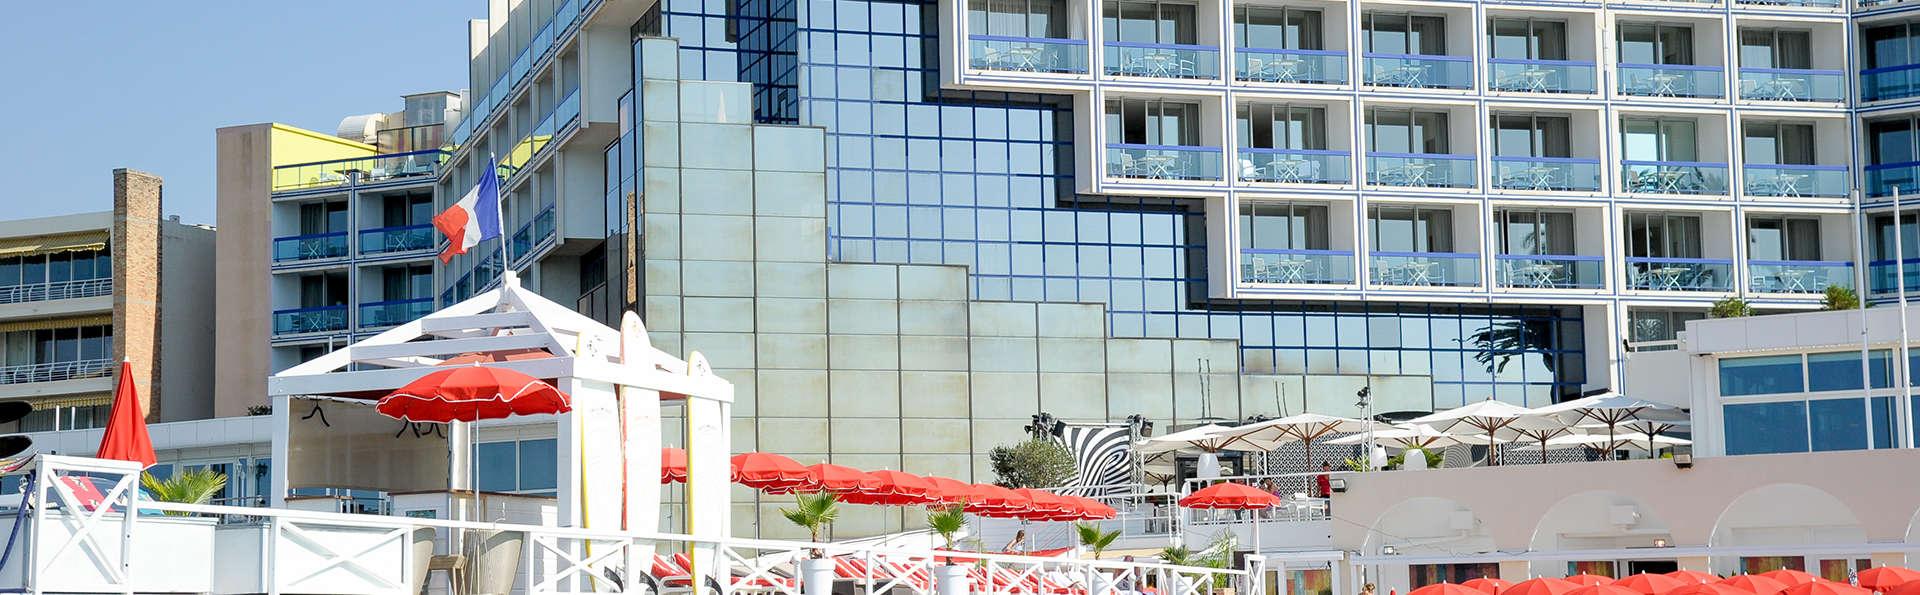 Garden Beach Hotel - edit__new2_front.jpg